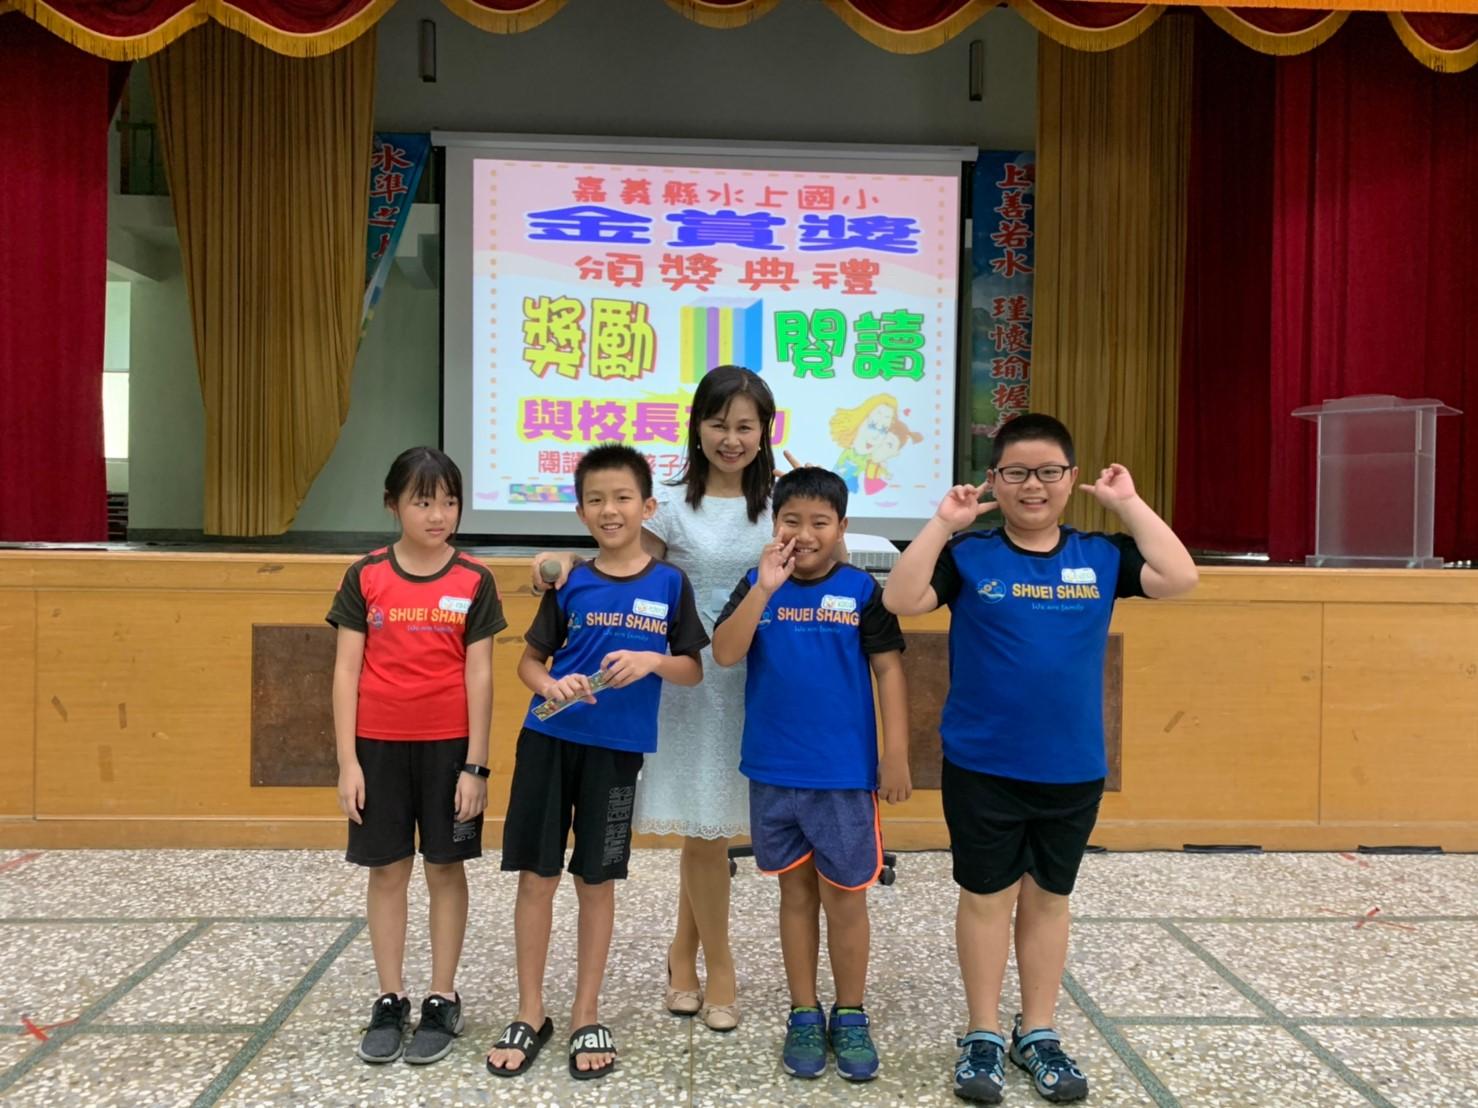 http://www.shsps.cyc.edu.tw/uploads/tadgallery/2019_06_24/1393_金賞獎_190621_0013.jpg